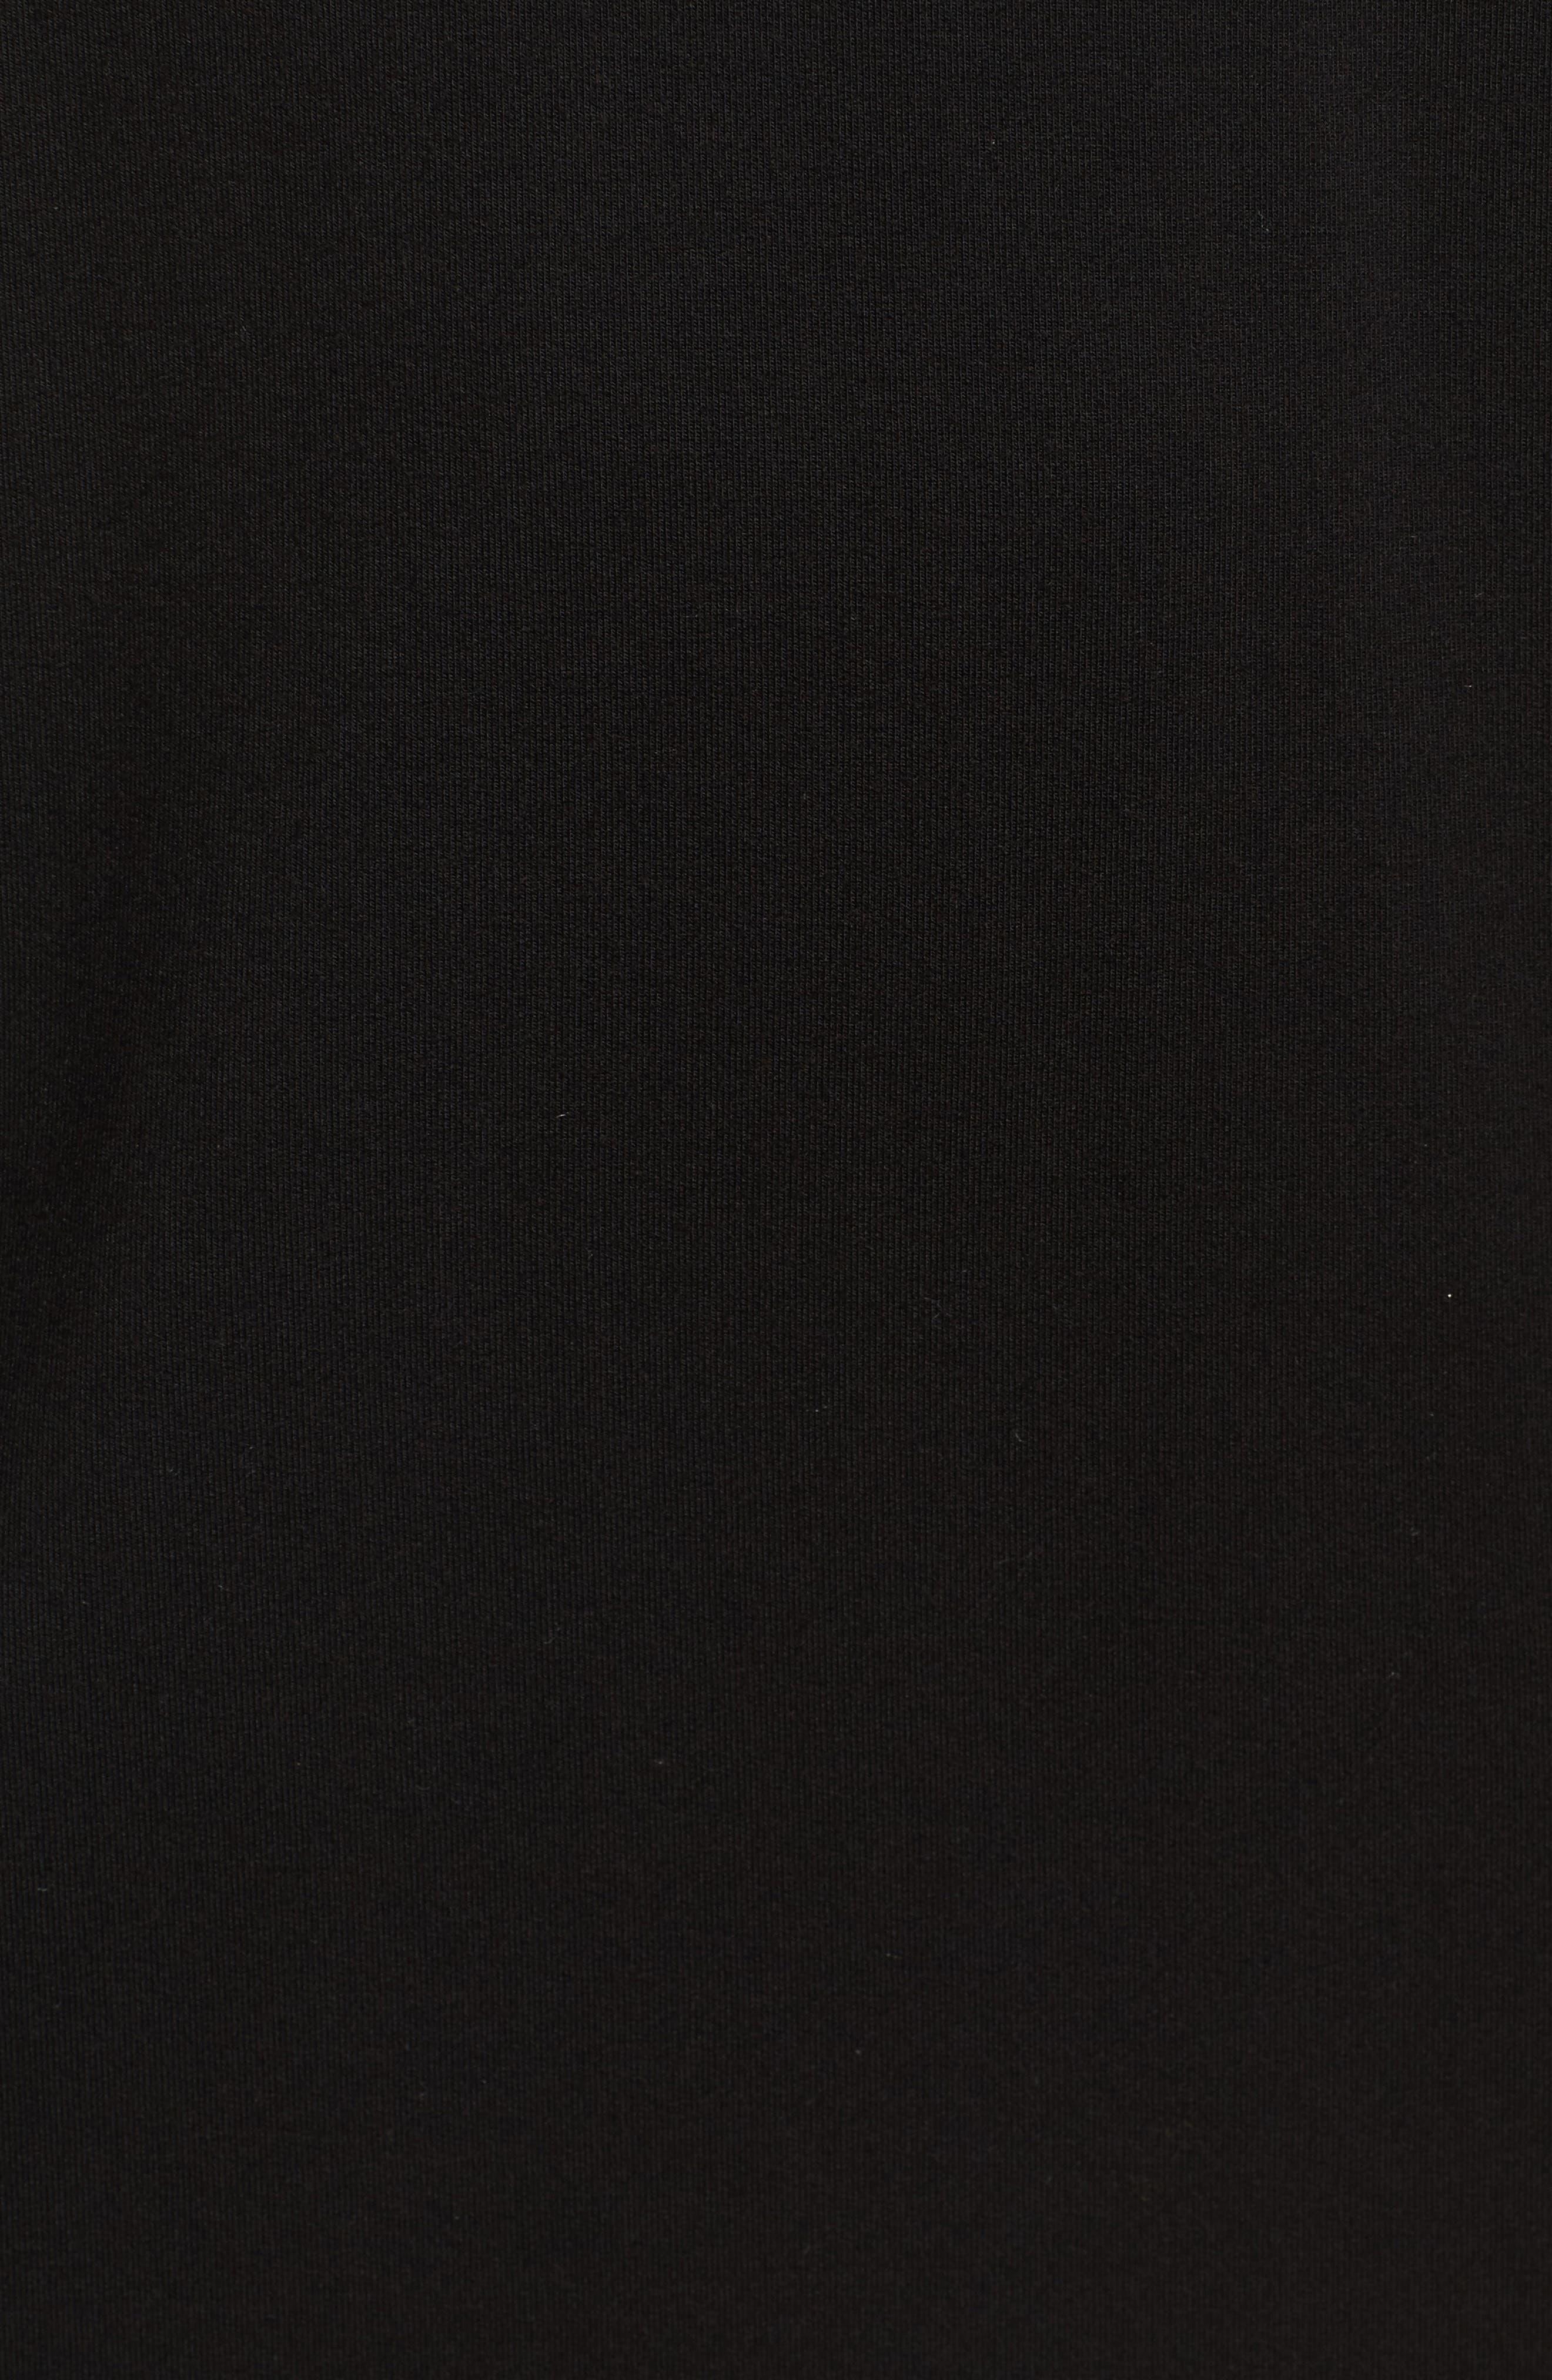 Celerina Lace-Up Minidress,                             Alternate thumbnail 5, color,                             001